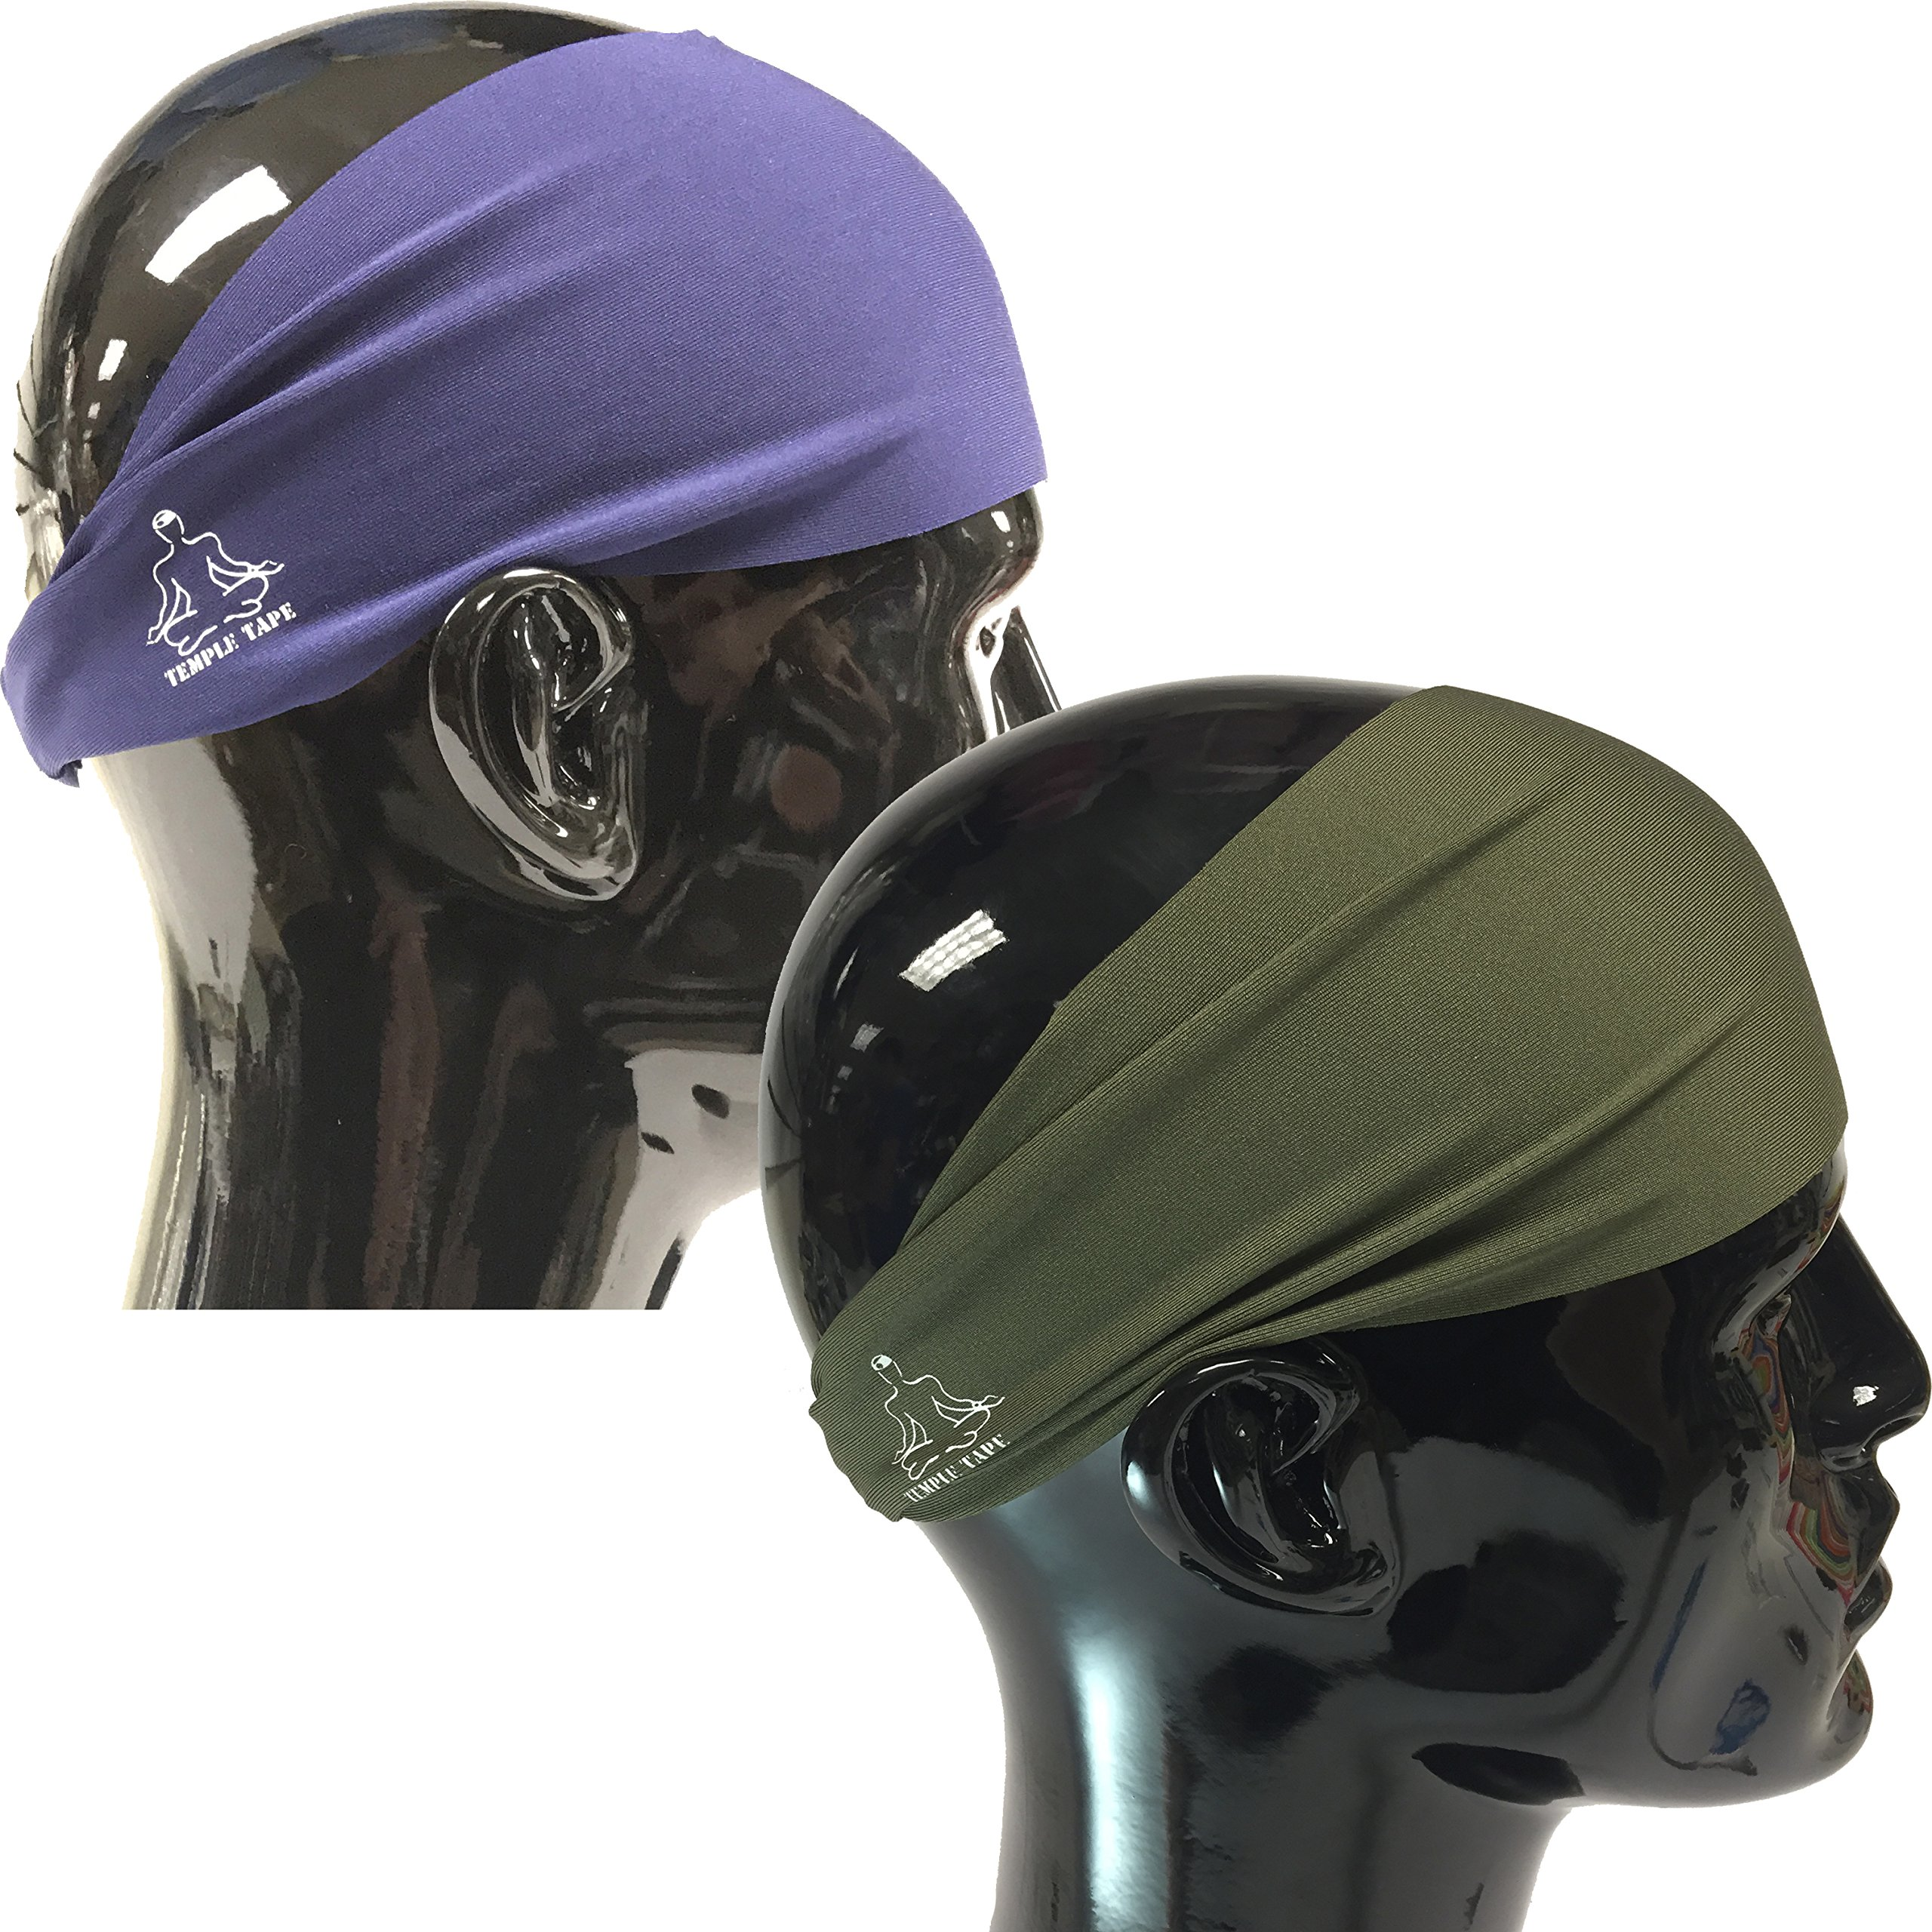 Value 2-Pack, Mens Headband - Guys Sweatband & Sports Headbands Moisture Wicking Workout Sweatbands for Running, Cross-Train, Skiing and bike helmet friendly - Value Pack 1-OD Green & 1-Navy Sweatband by Temple Tape